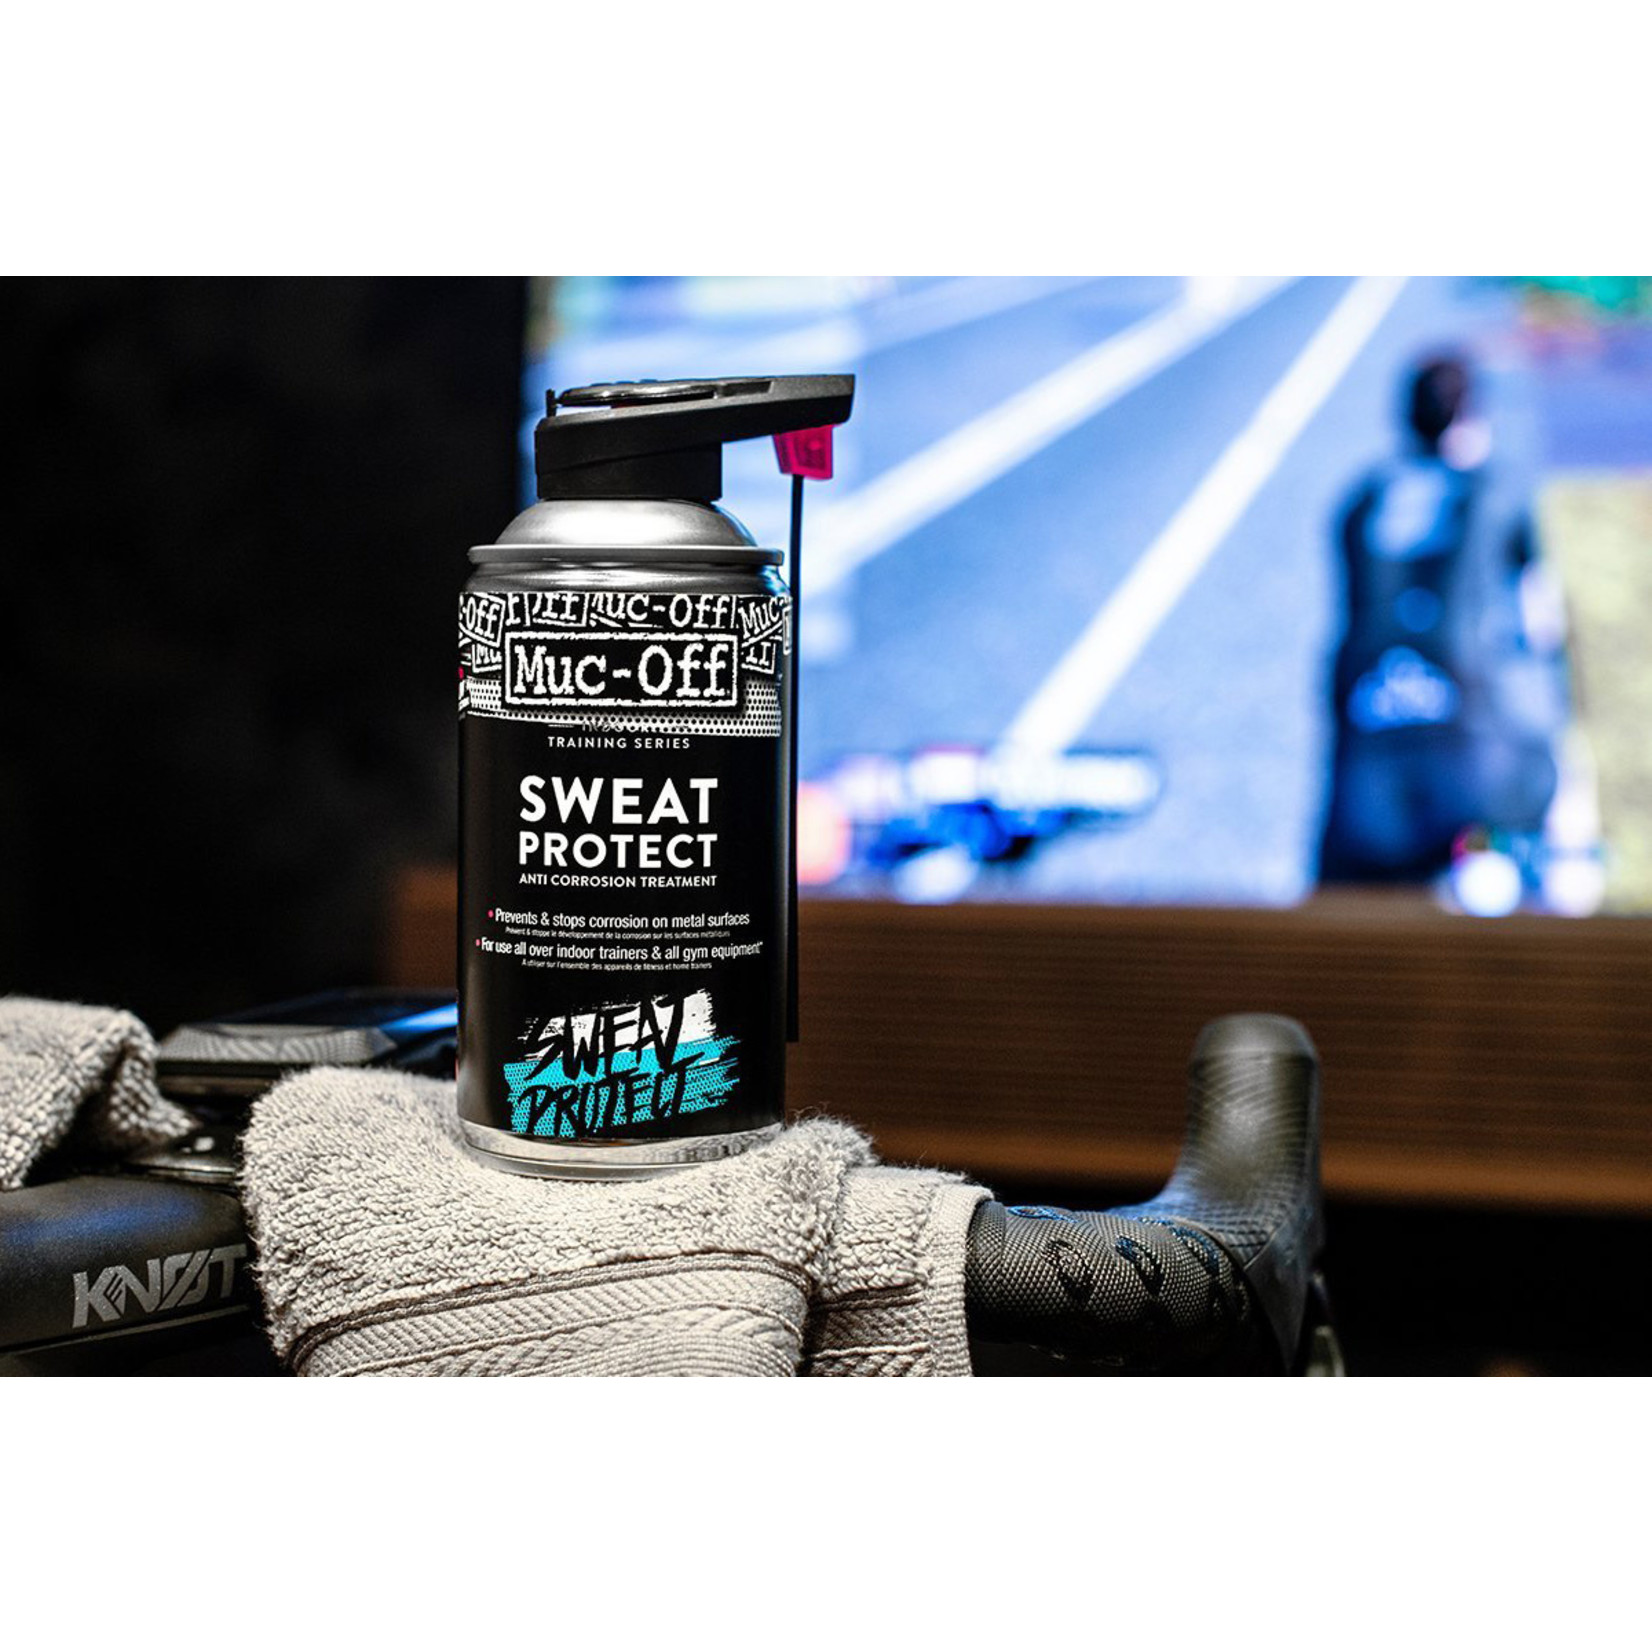 muc-off Muc-Off Sweat Protect Spray 300ml